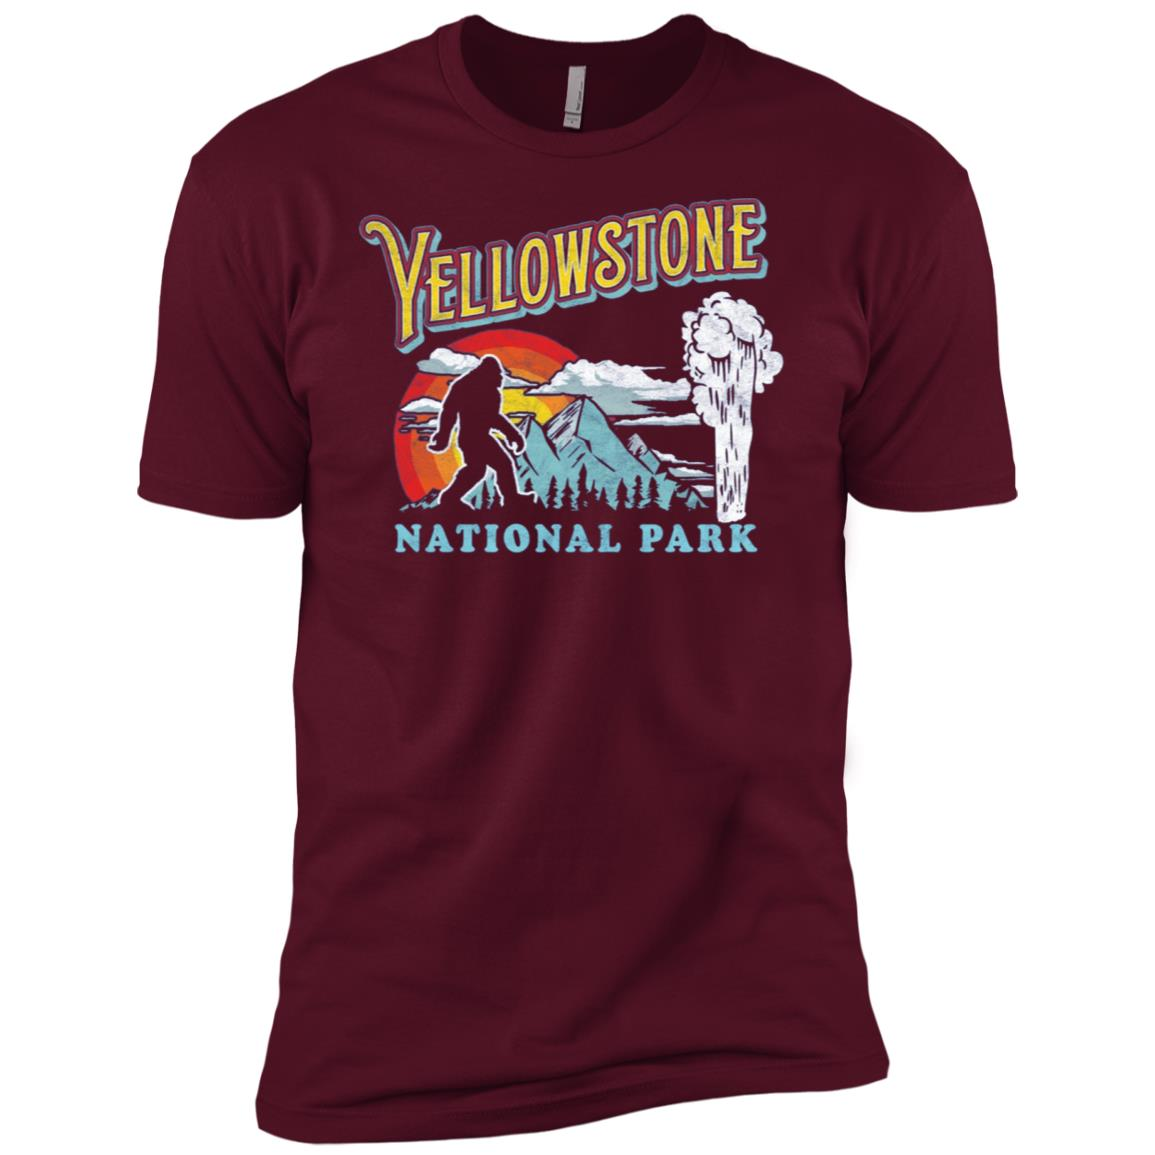 Yellowstone Bigfoot National Park Geyser Men Short Sleeve T-Shirt